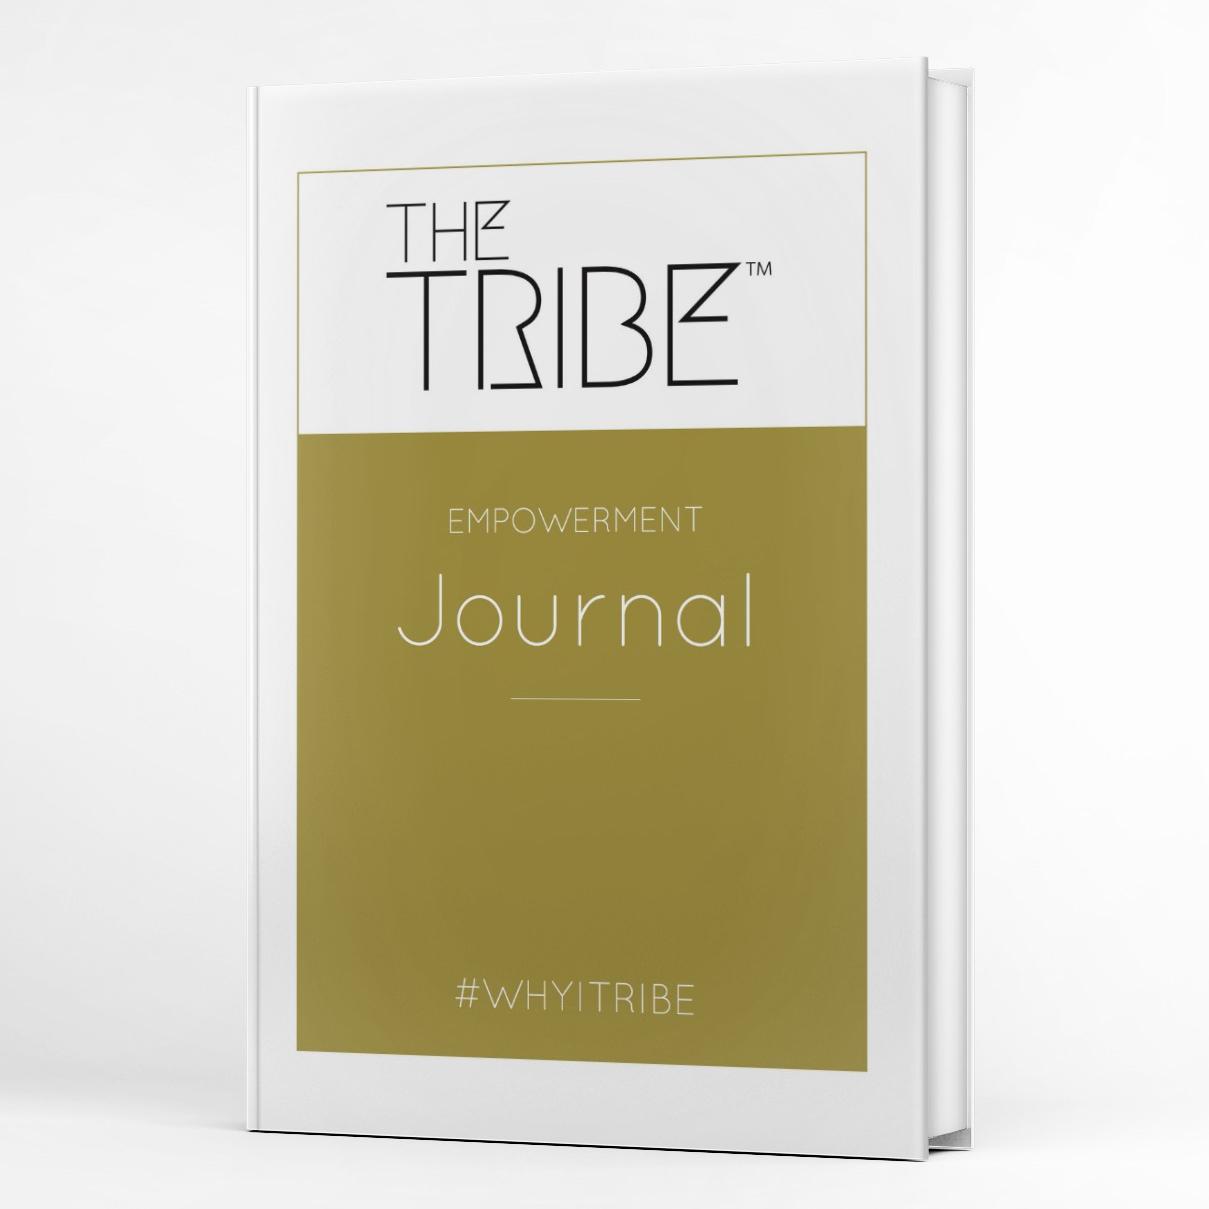 The Empowerment Journal.jpgMindful Journals - The Empowerment Journal